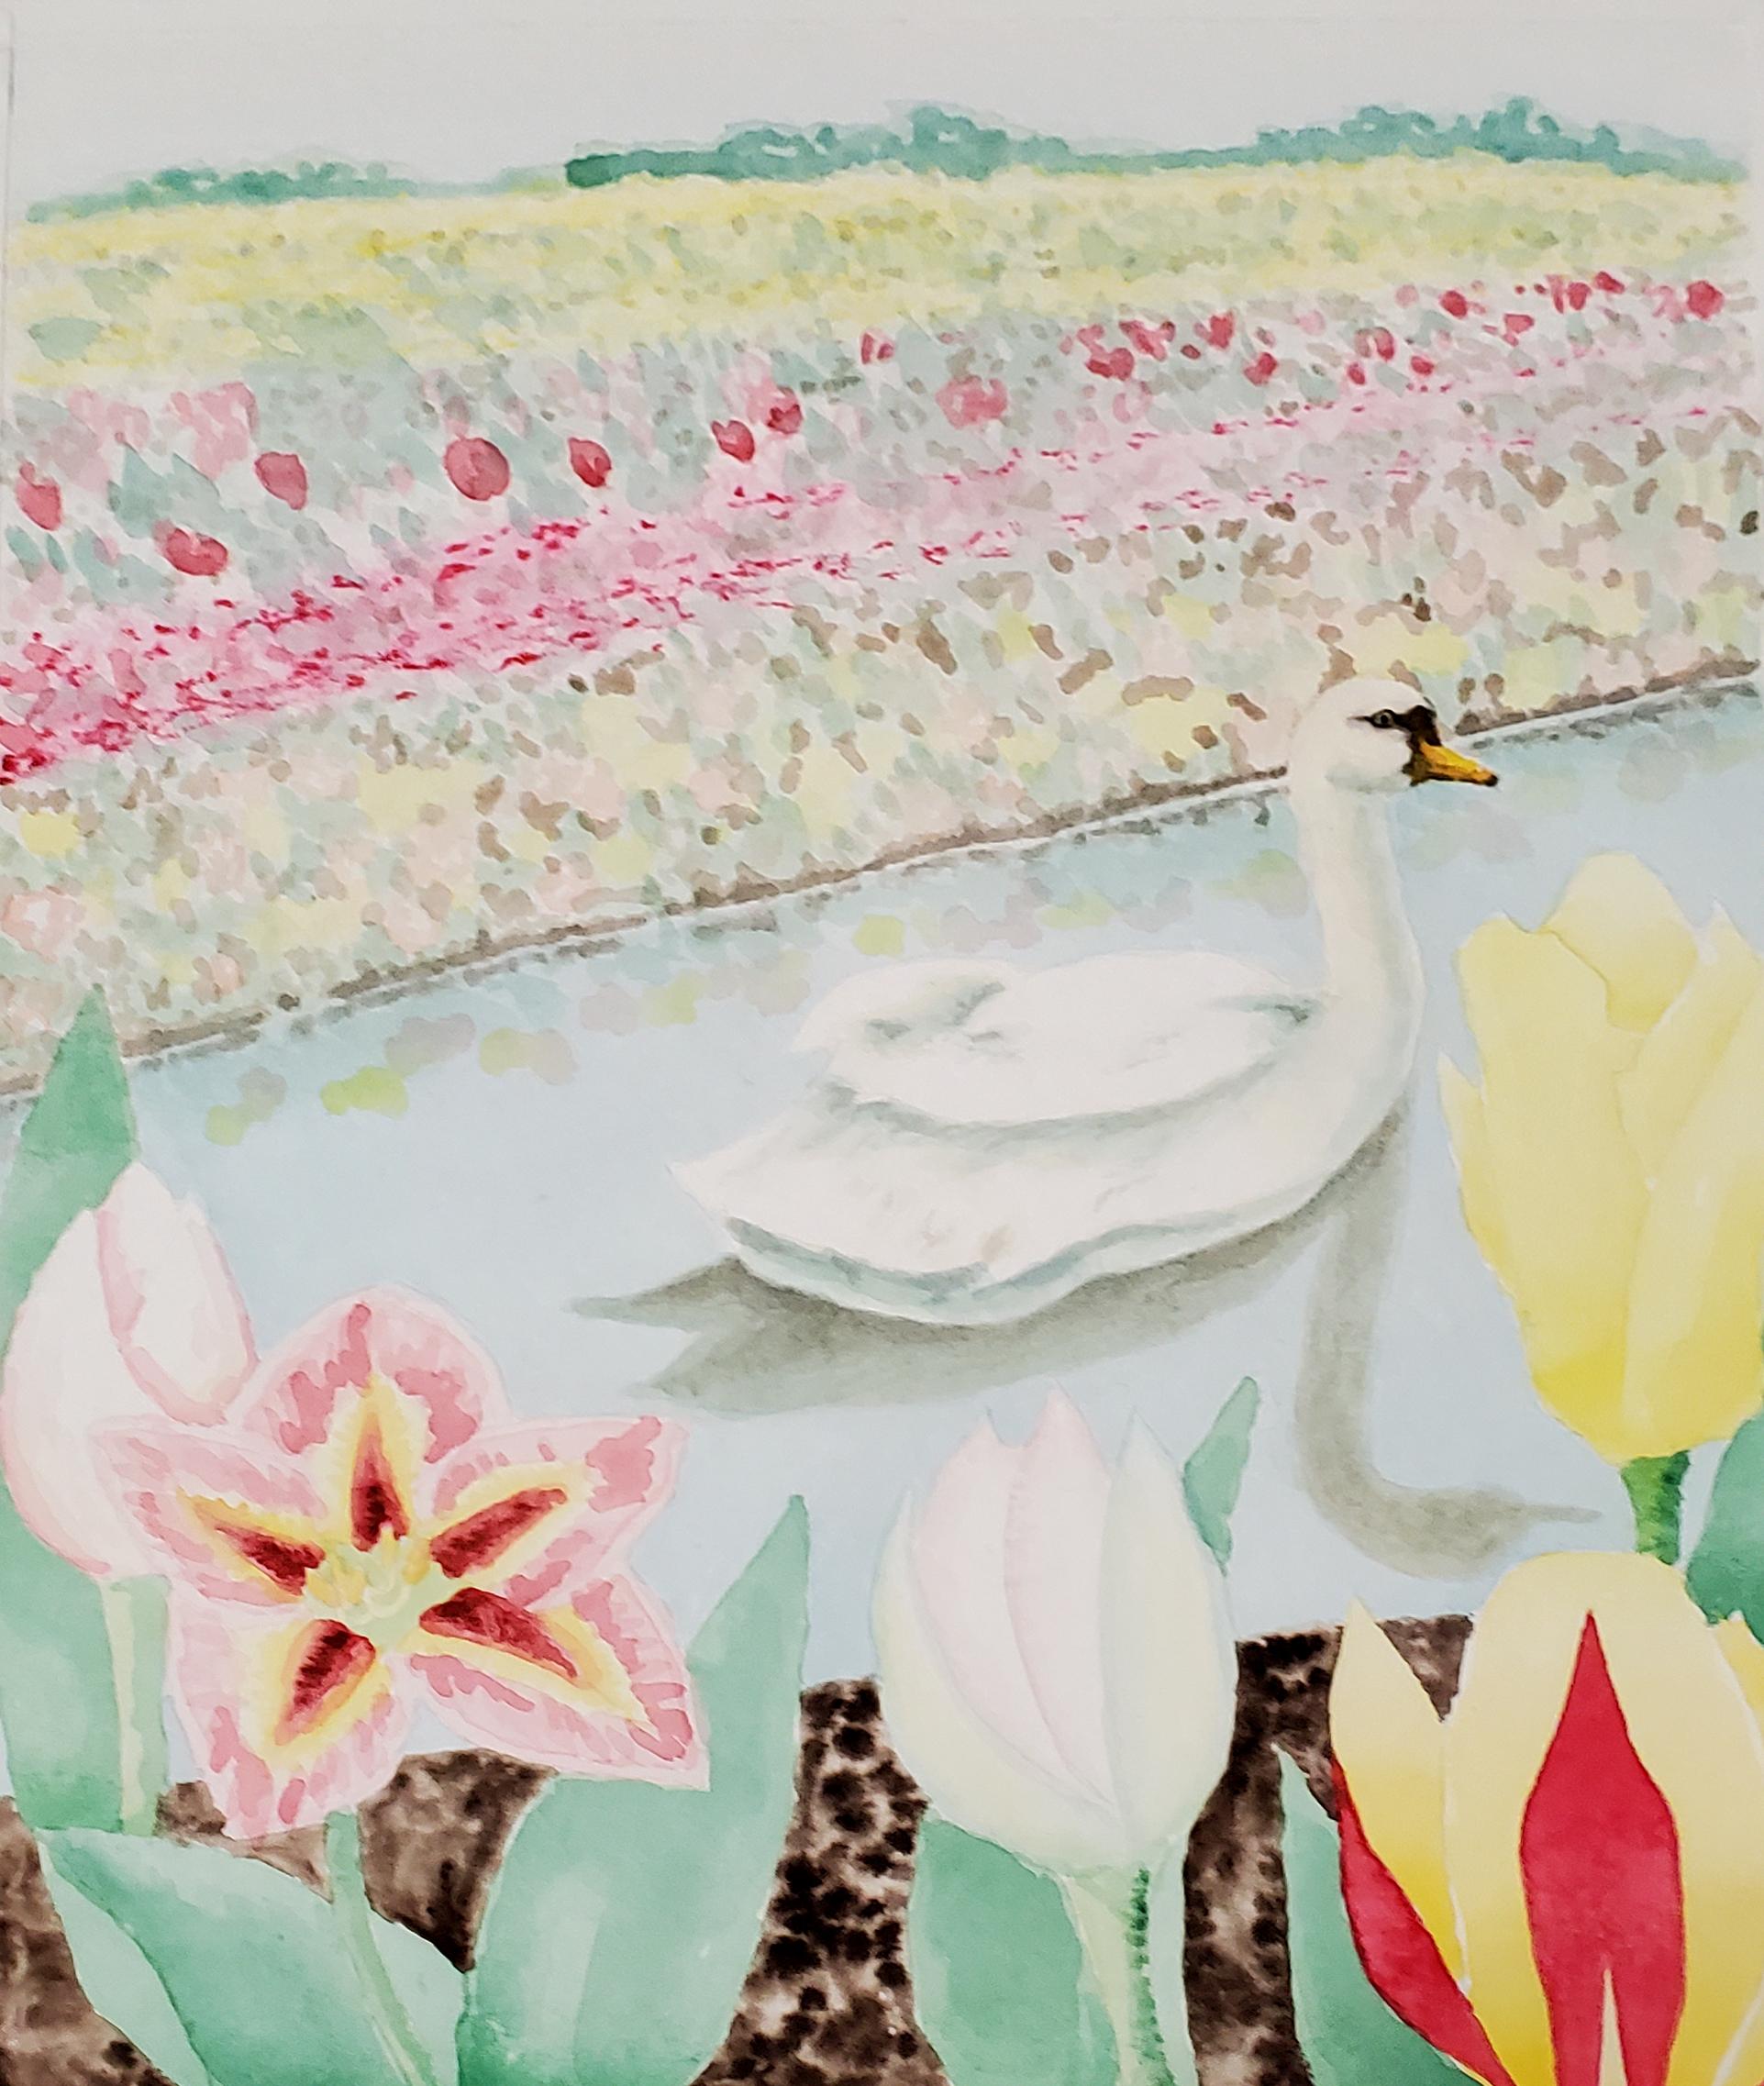 Tulip Fields & Swan on the Keukenhof Canal